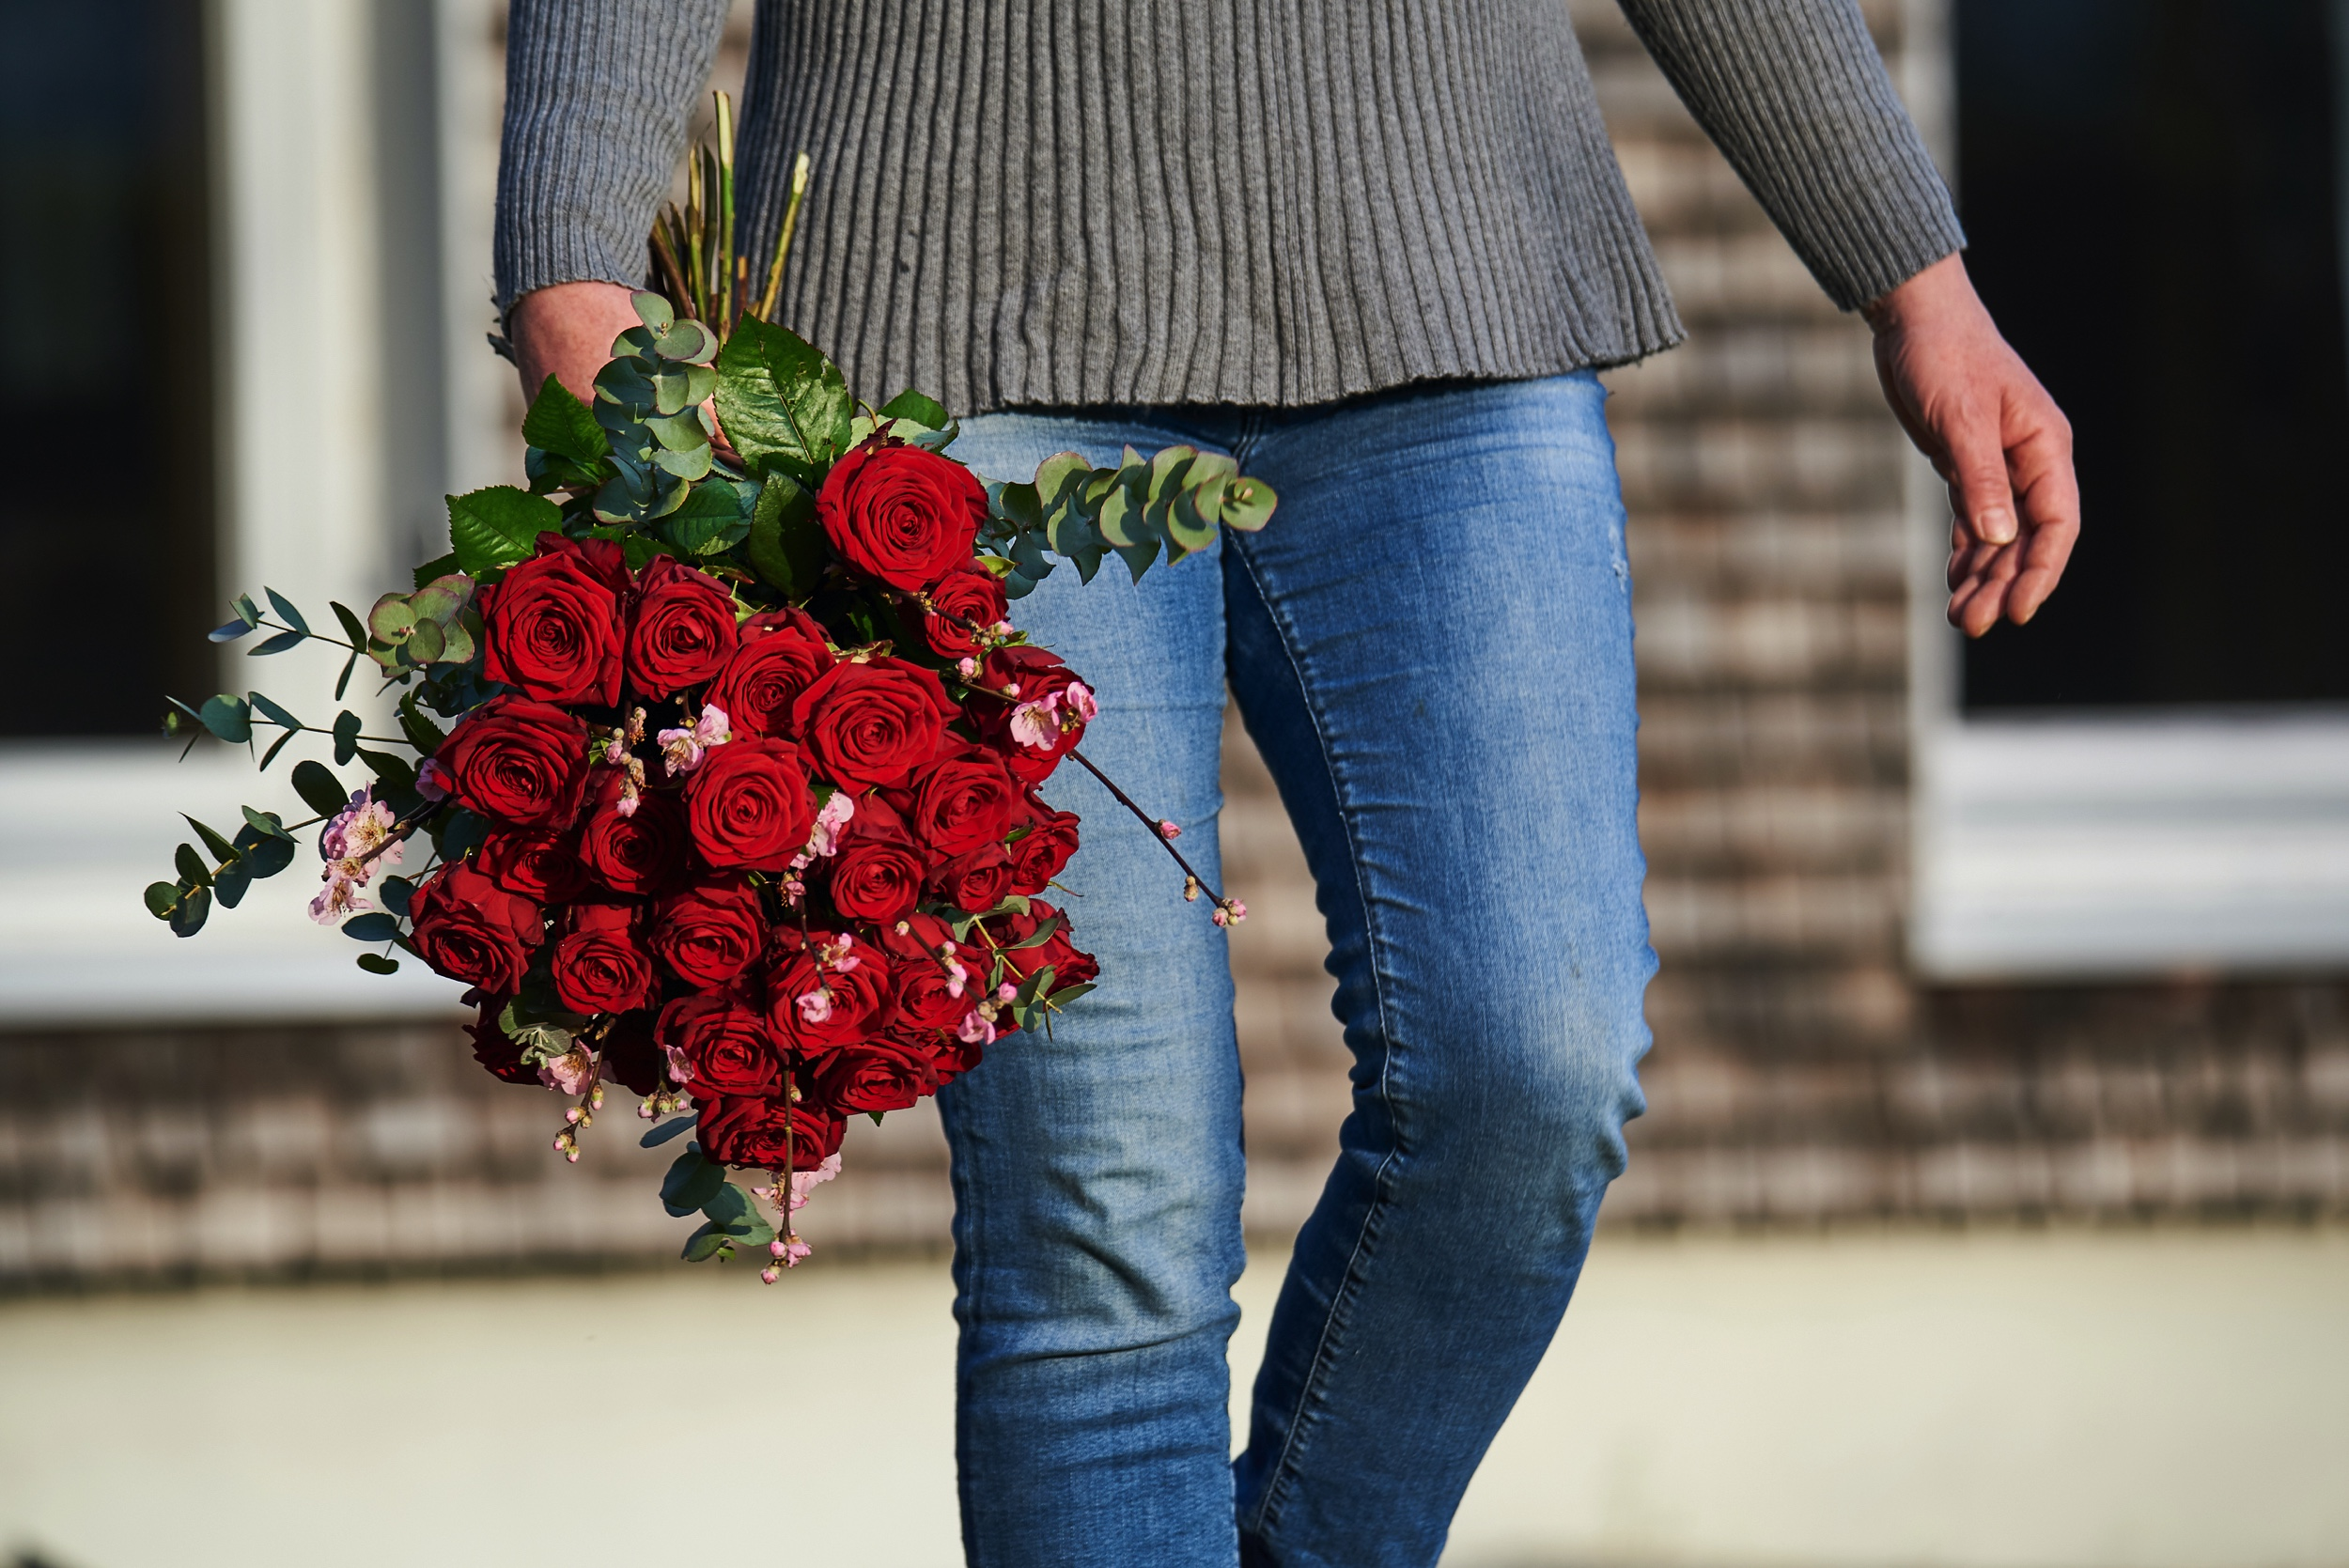 Blumenlieferung In Kempten